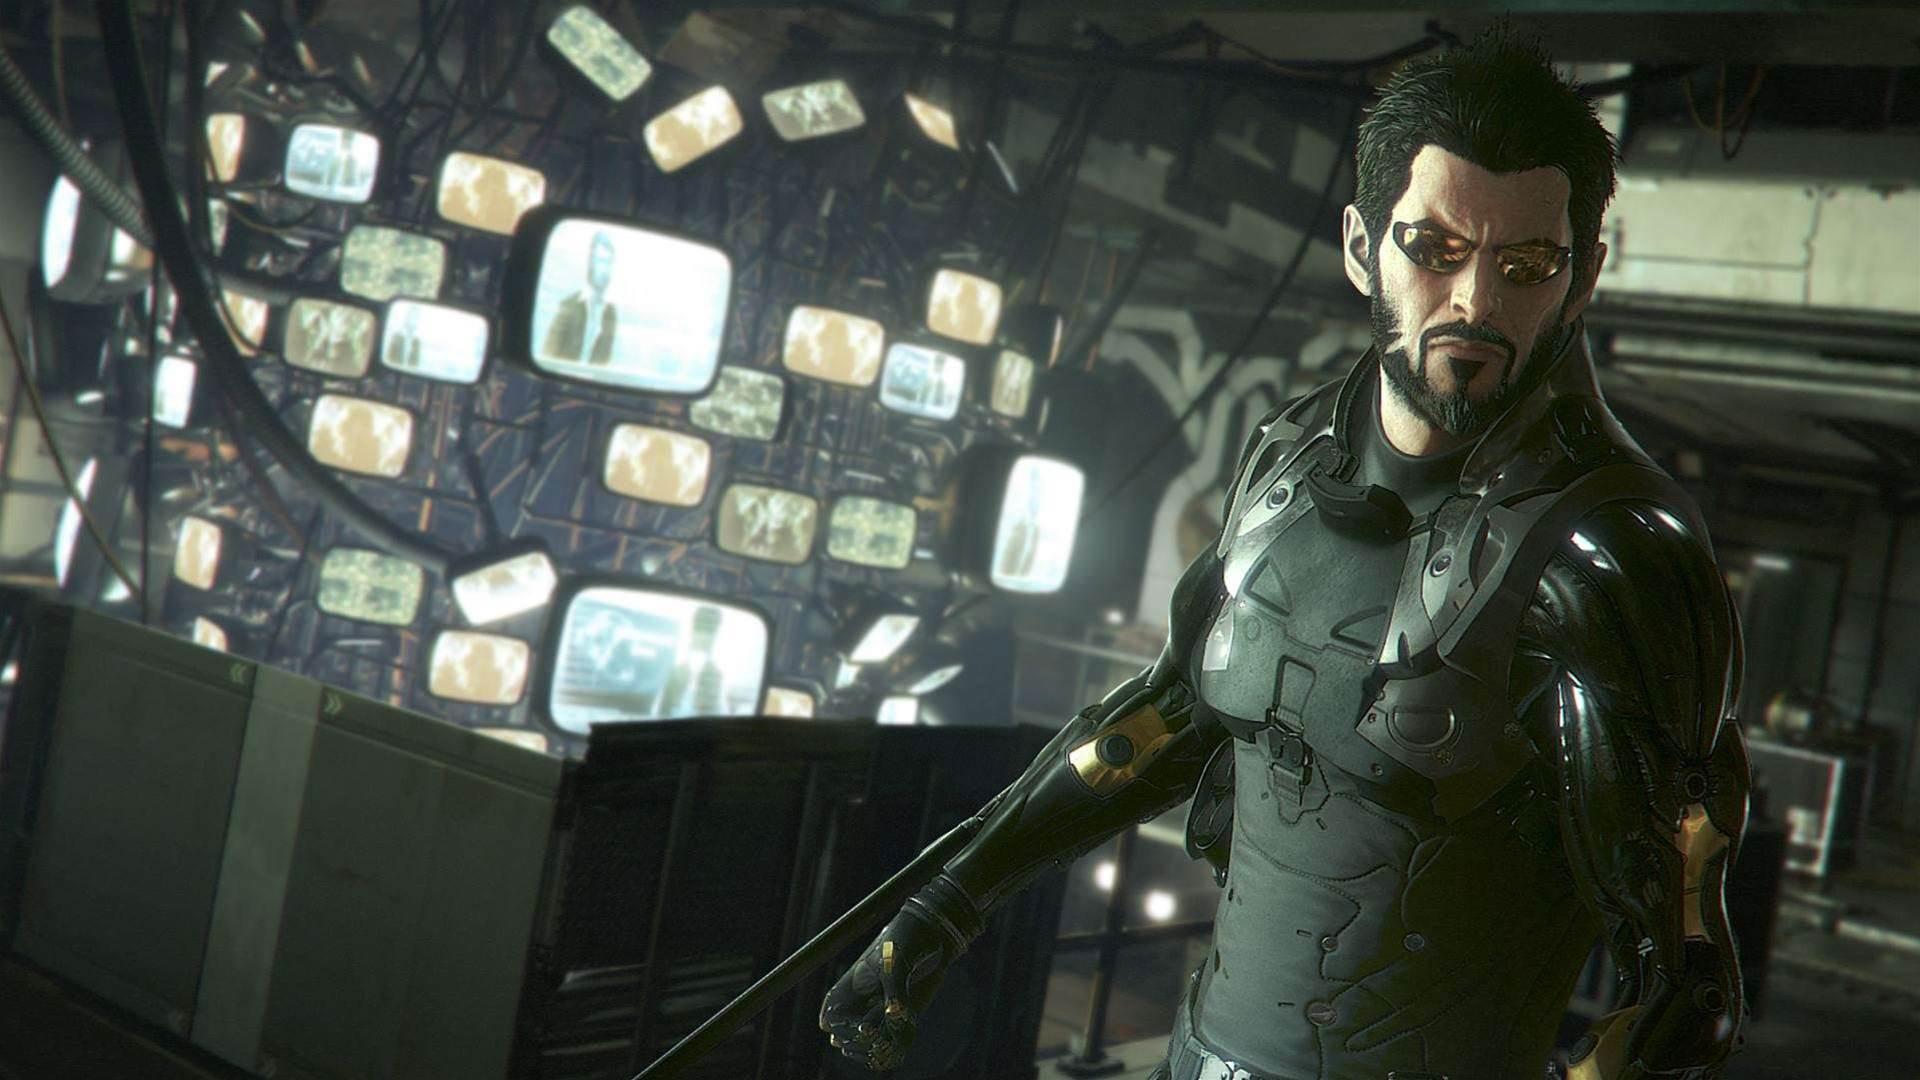 E3 2016 - Deus Ex: Mankind Divided screenshots